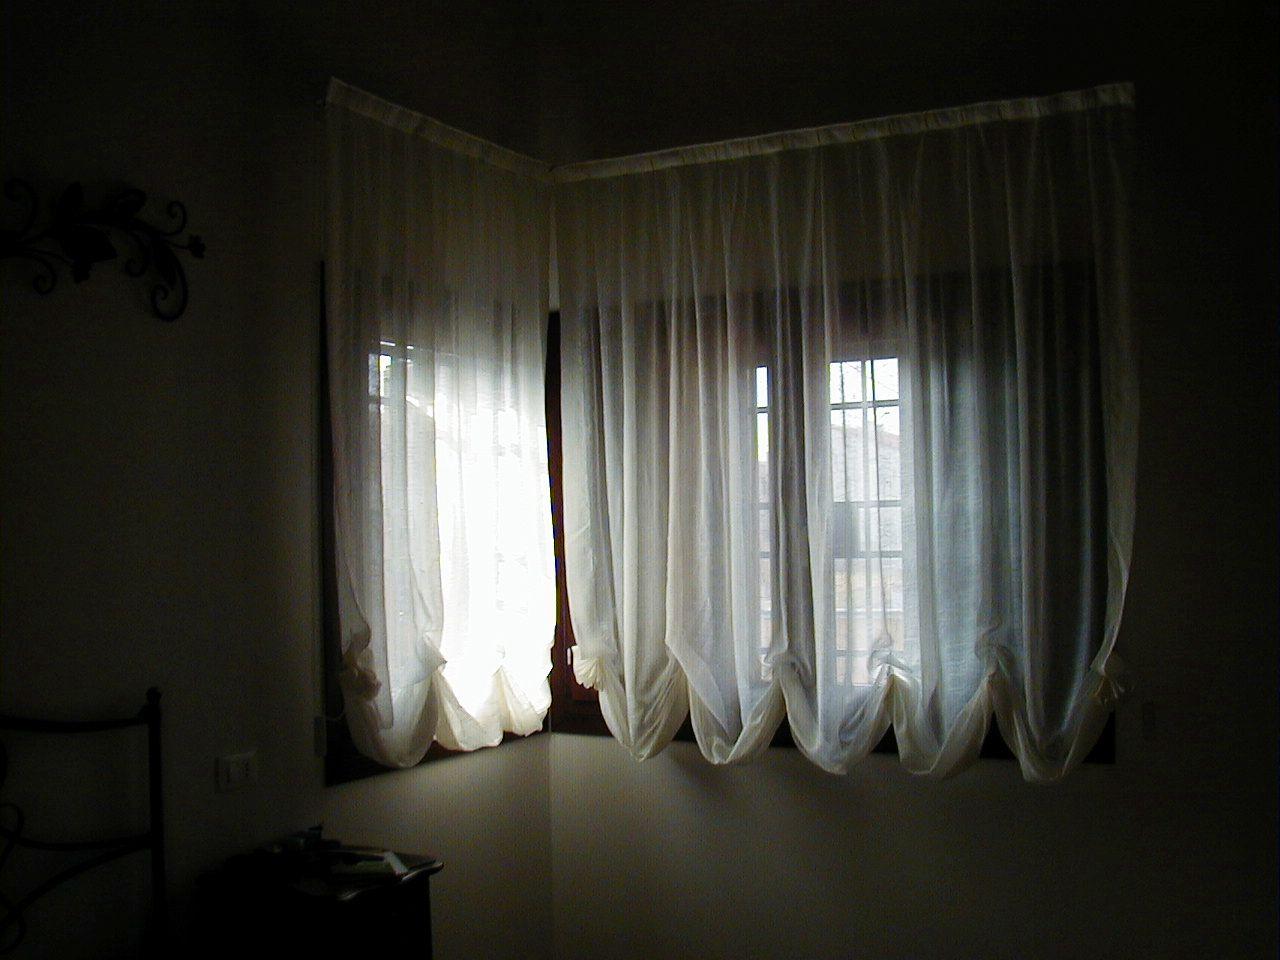 camera buia con tende